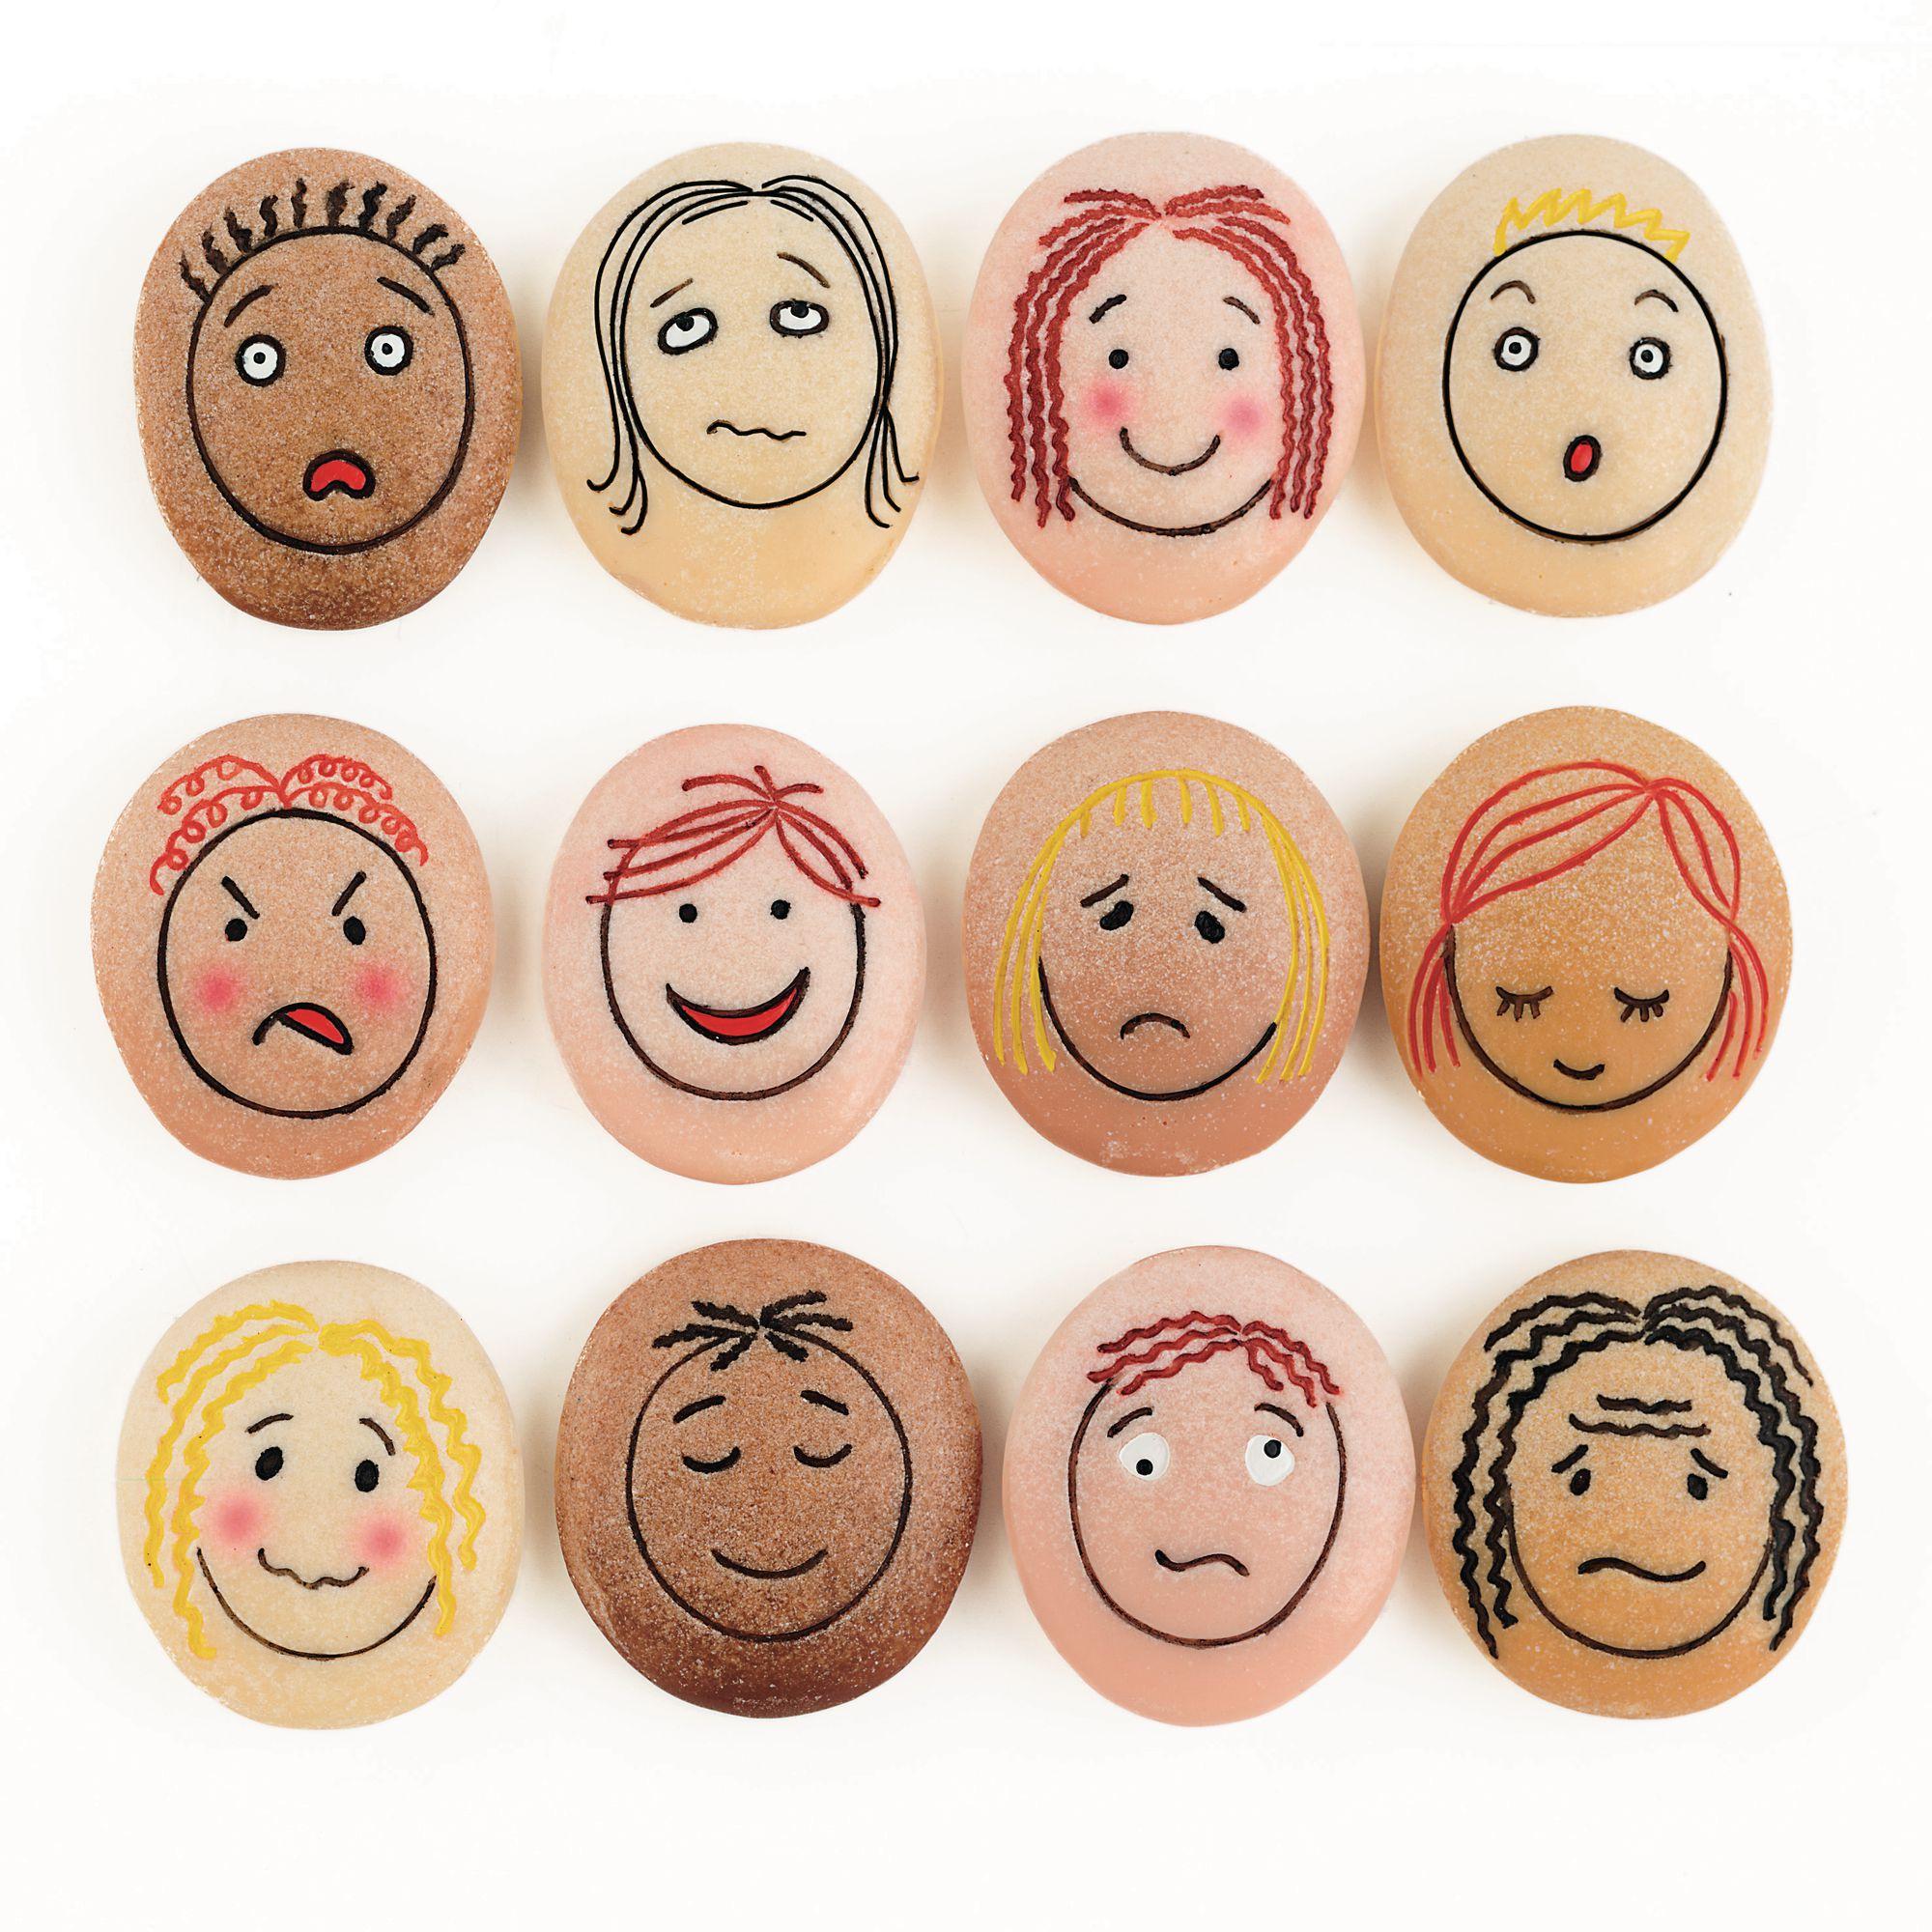 Emotion Stones - HE1203150 | Hope Education